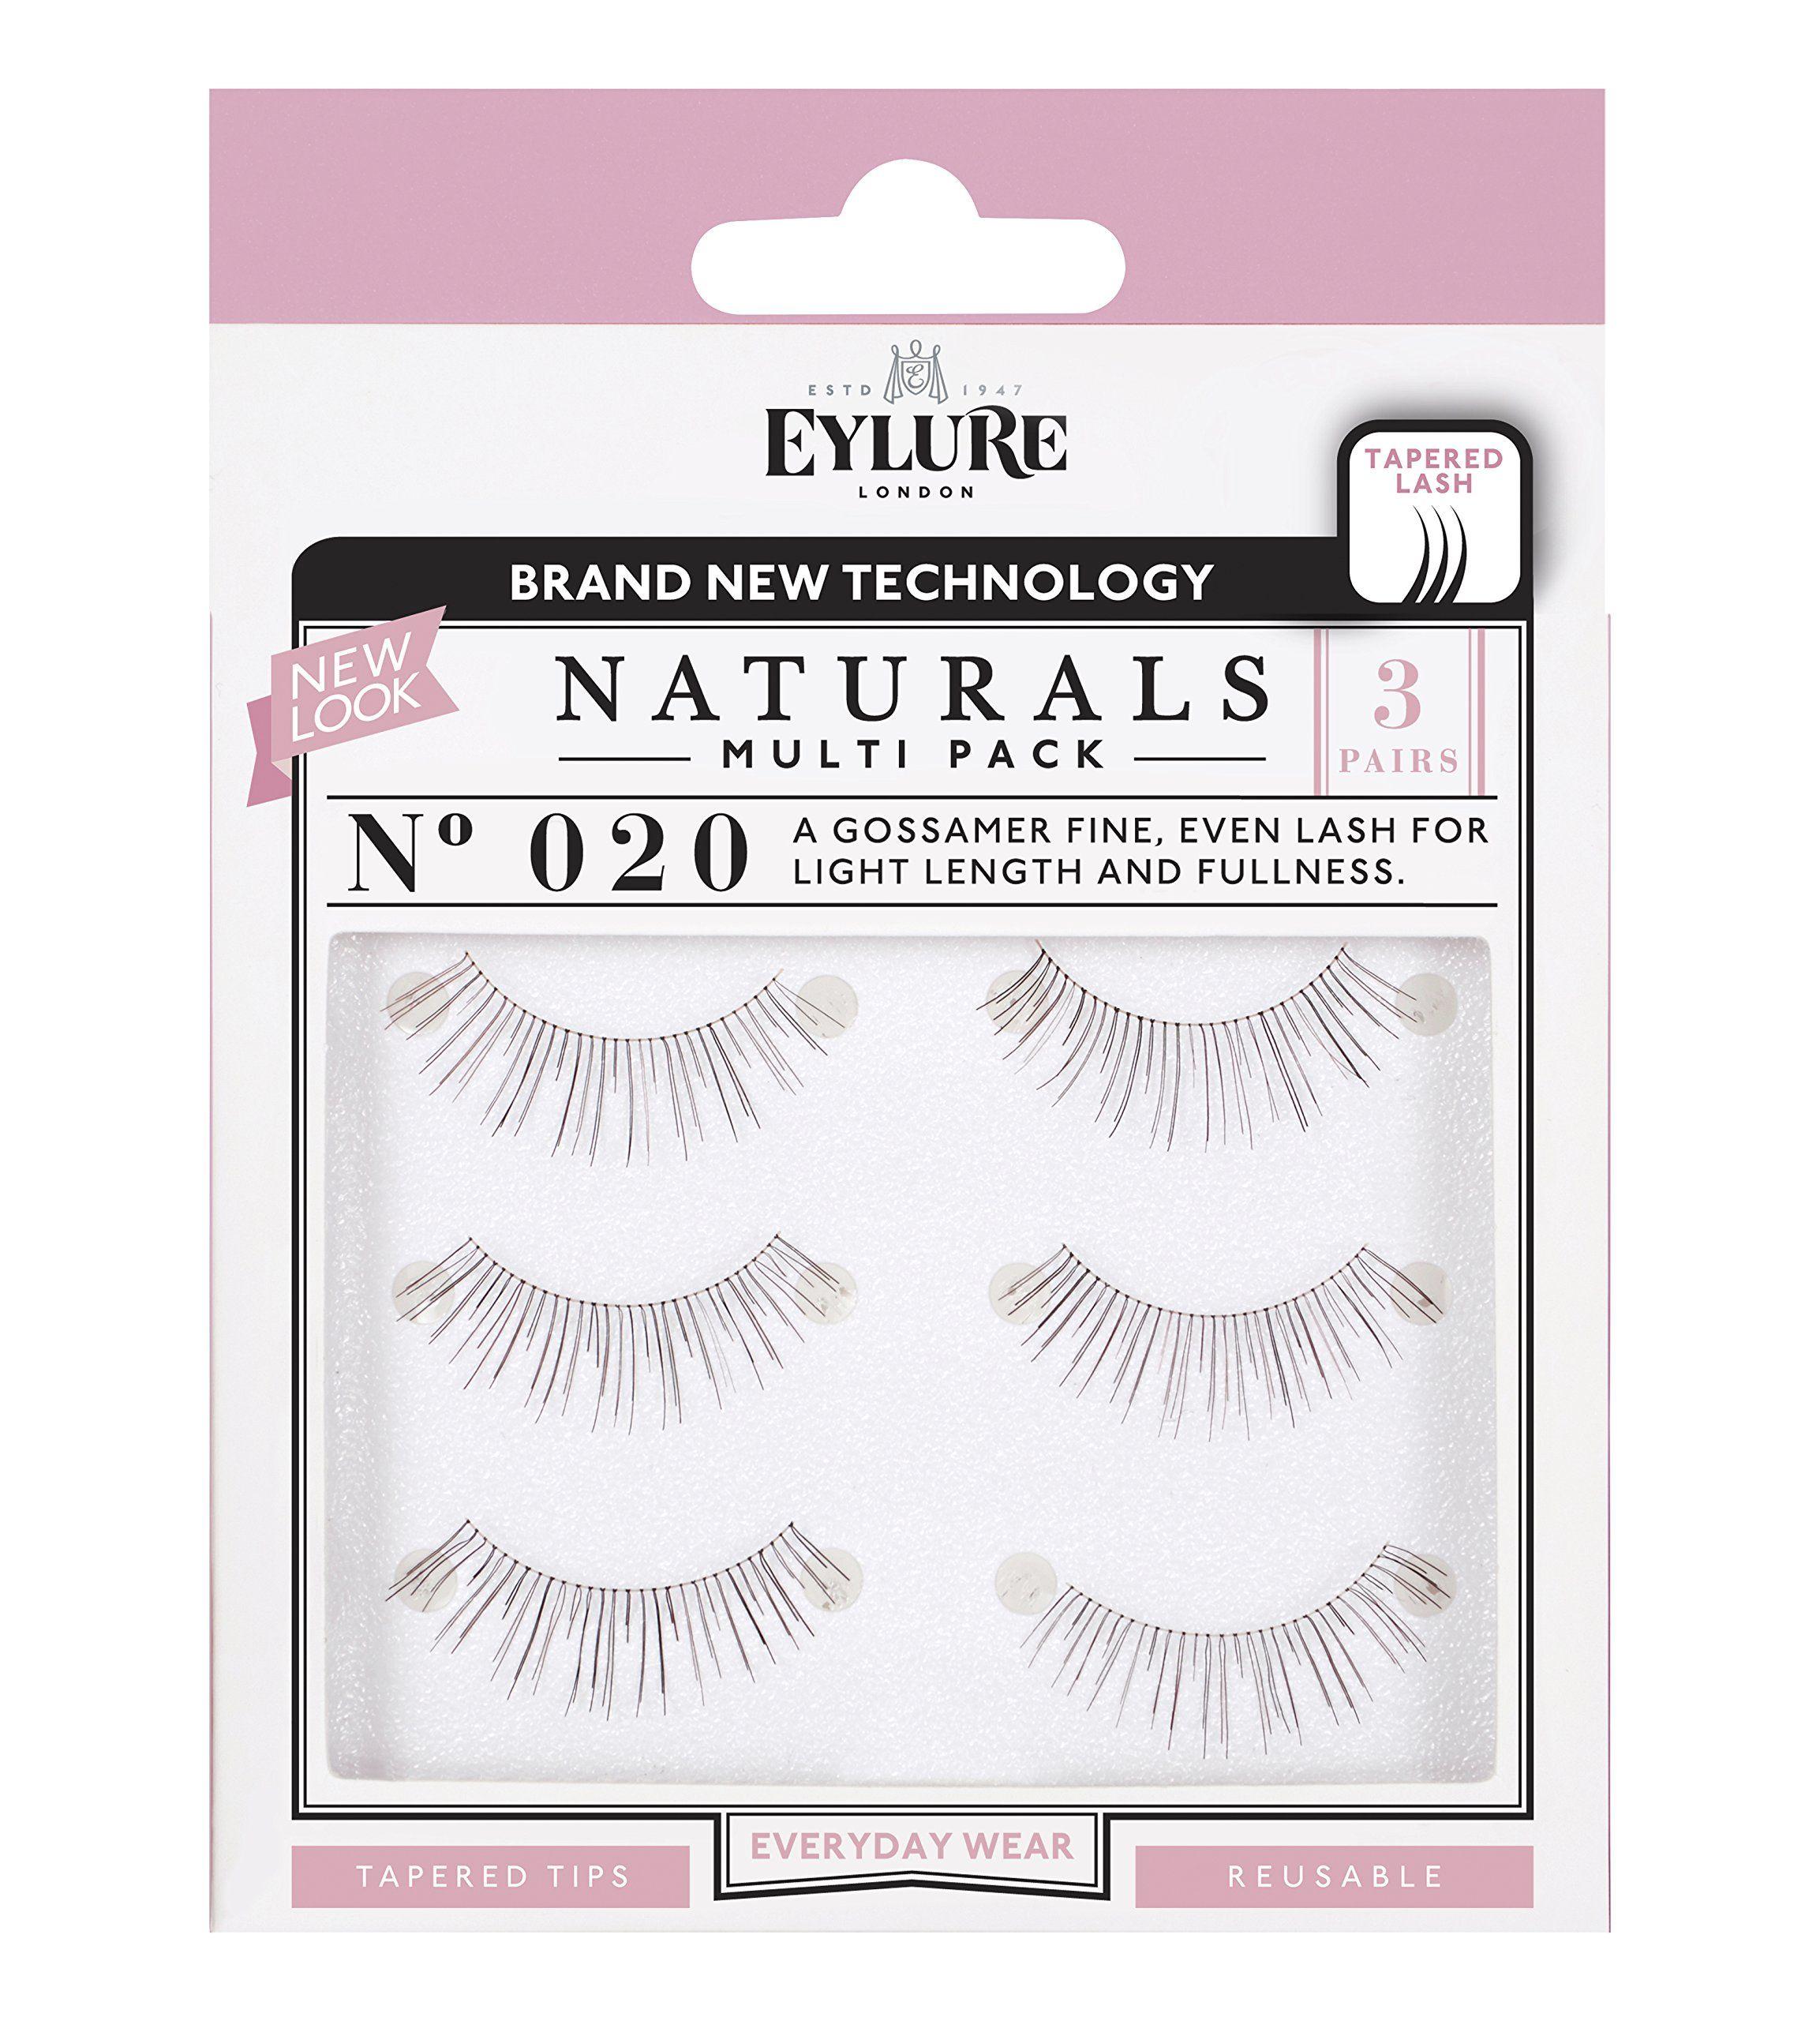 d4663565489 Multi Pack- 3 Pairs) Eylure Naturalites #020 False Eyelashes, Black ...